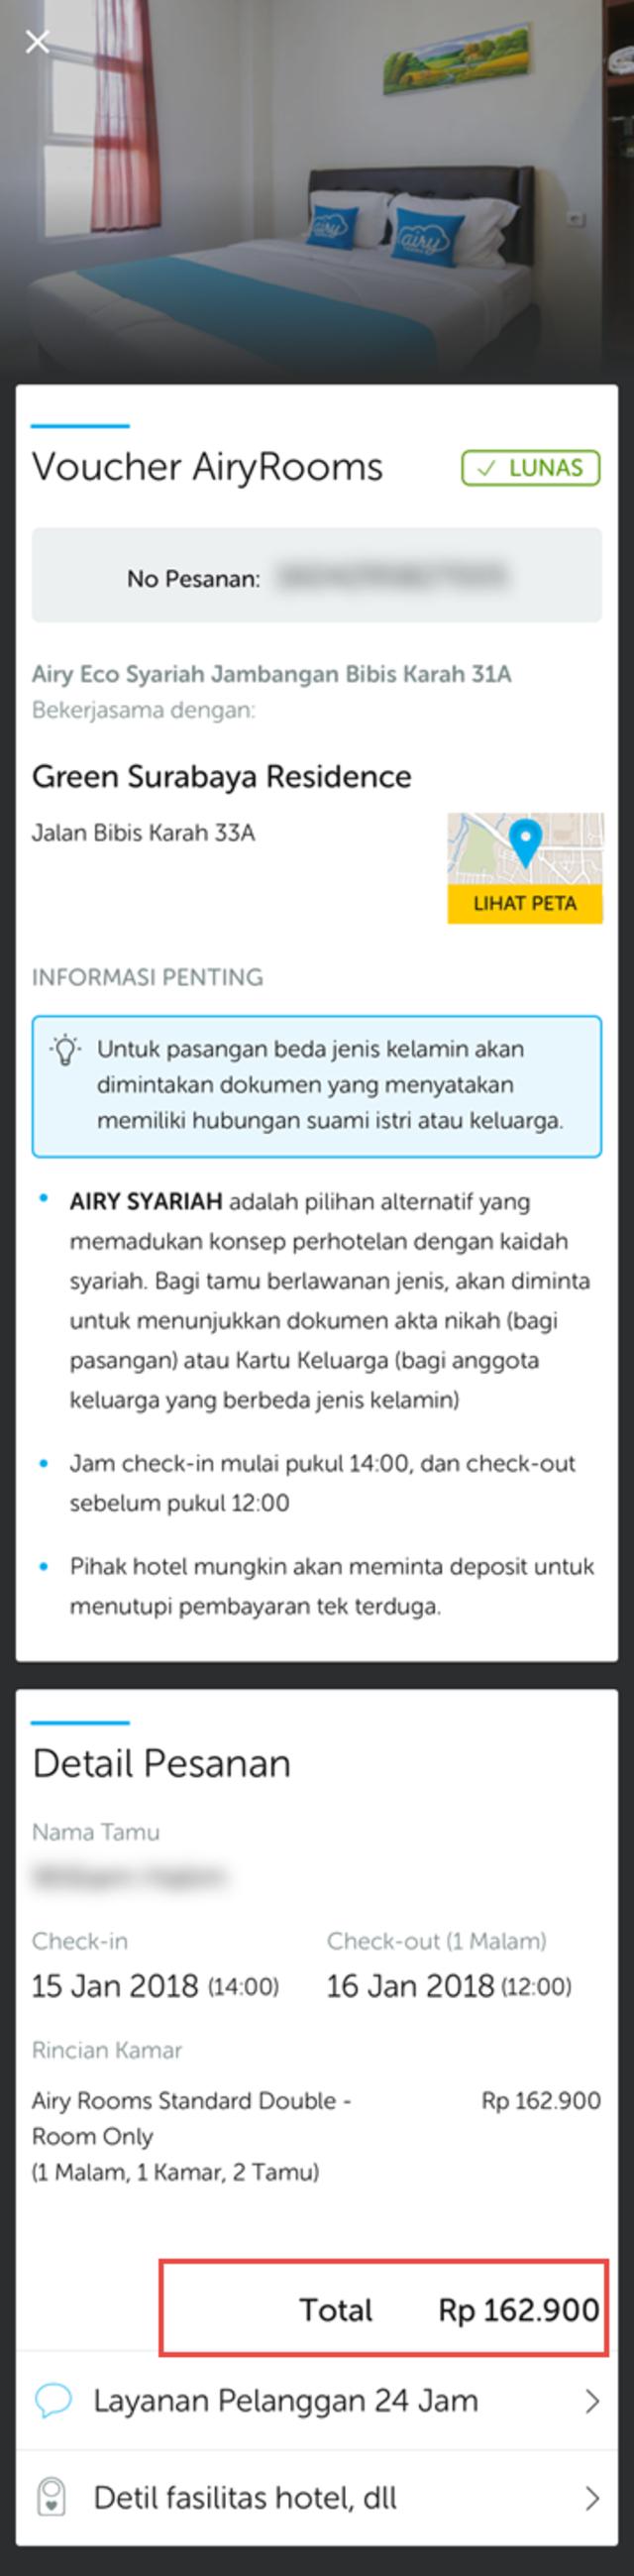 Airy Rooms Memang Anti Bikin Kecewa - Review Pengalaman Gue (3842)